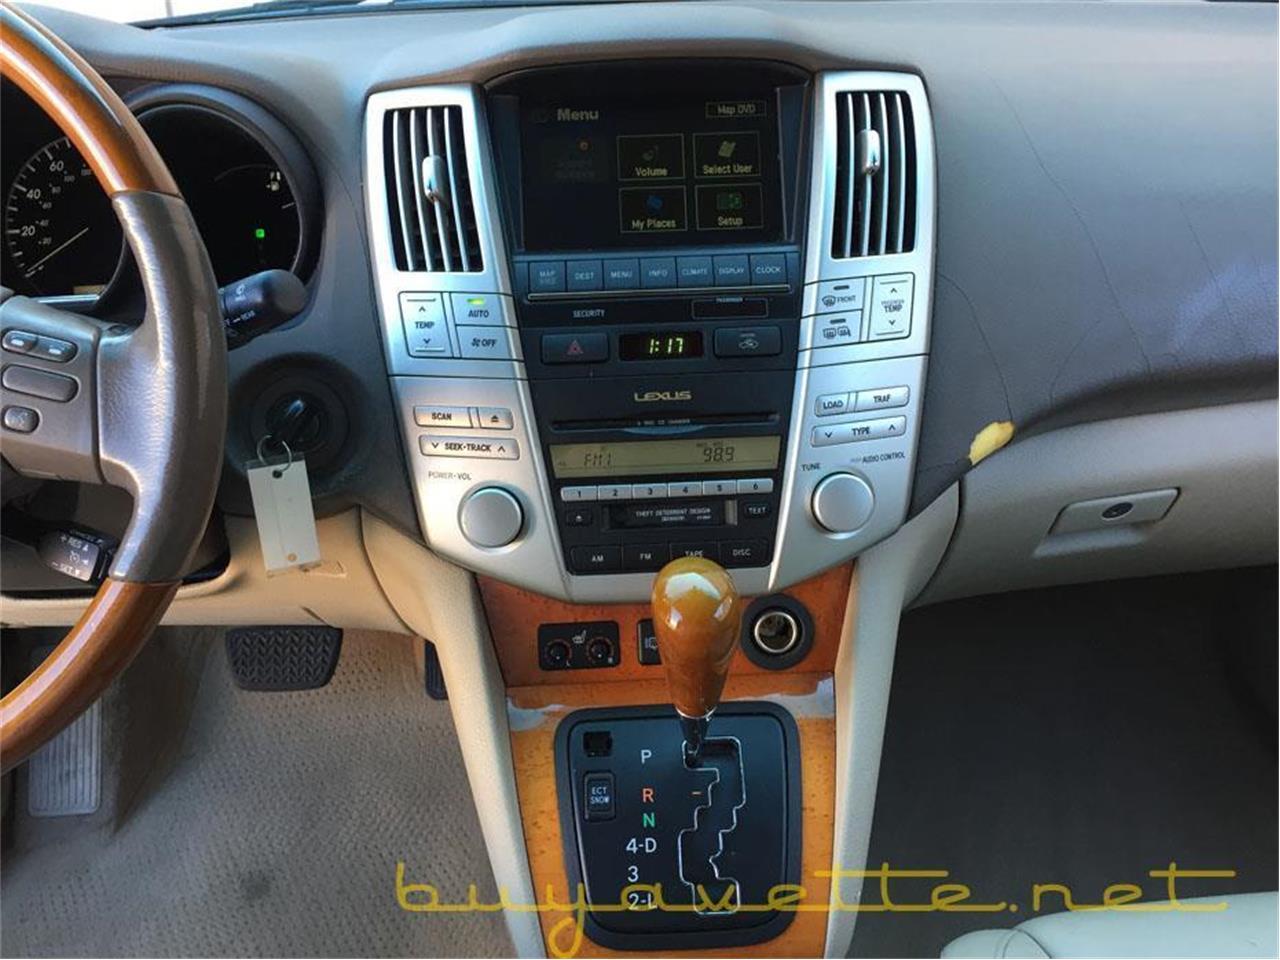 2005 Lexus Rx330 For Sale Cc 1027523 Interior Large Picture Of 05 M0ub